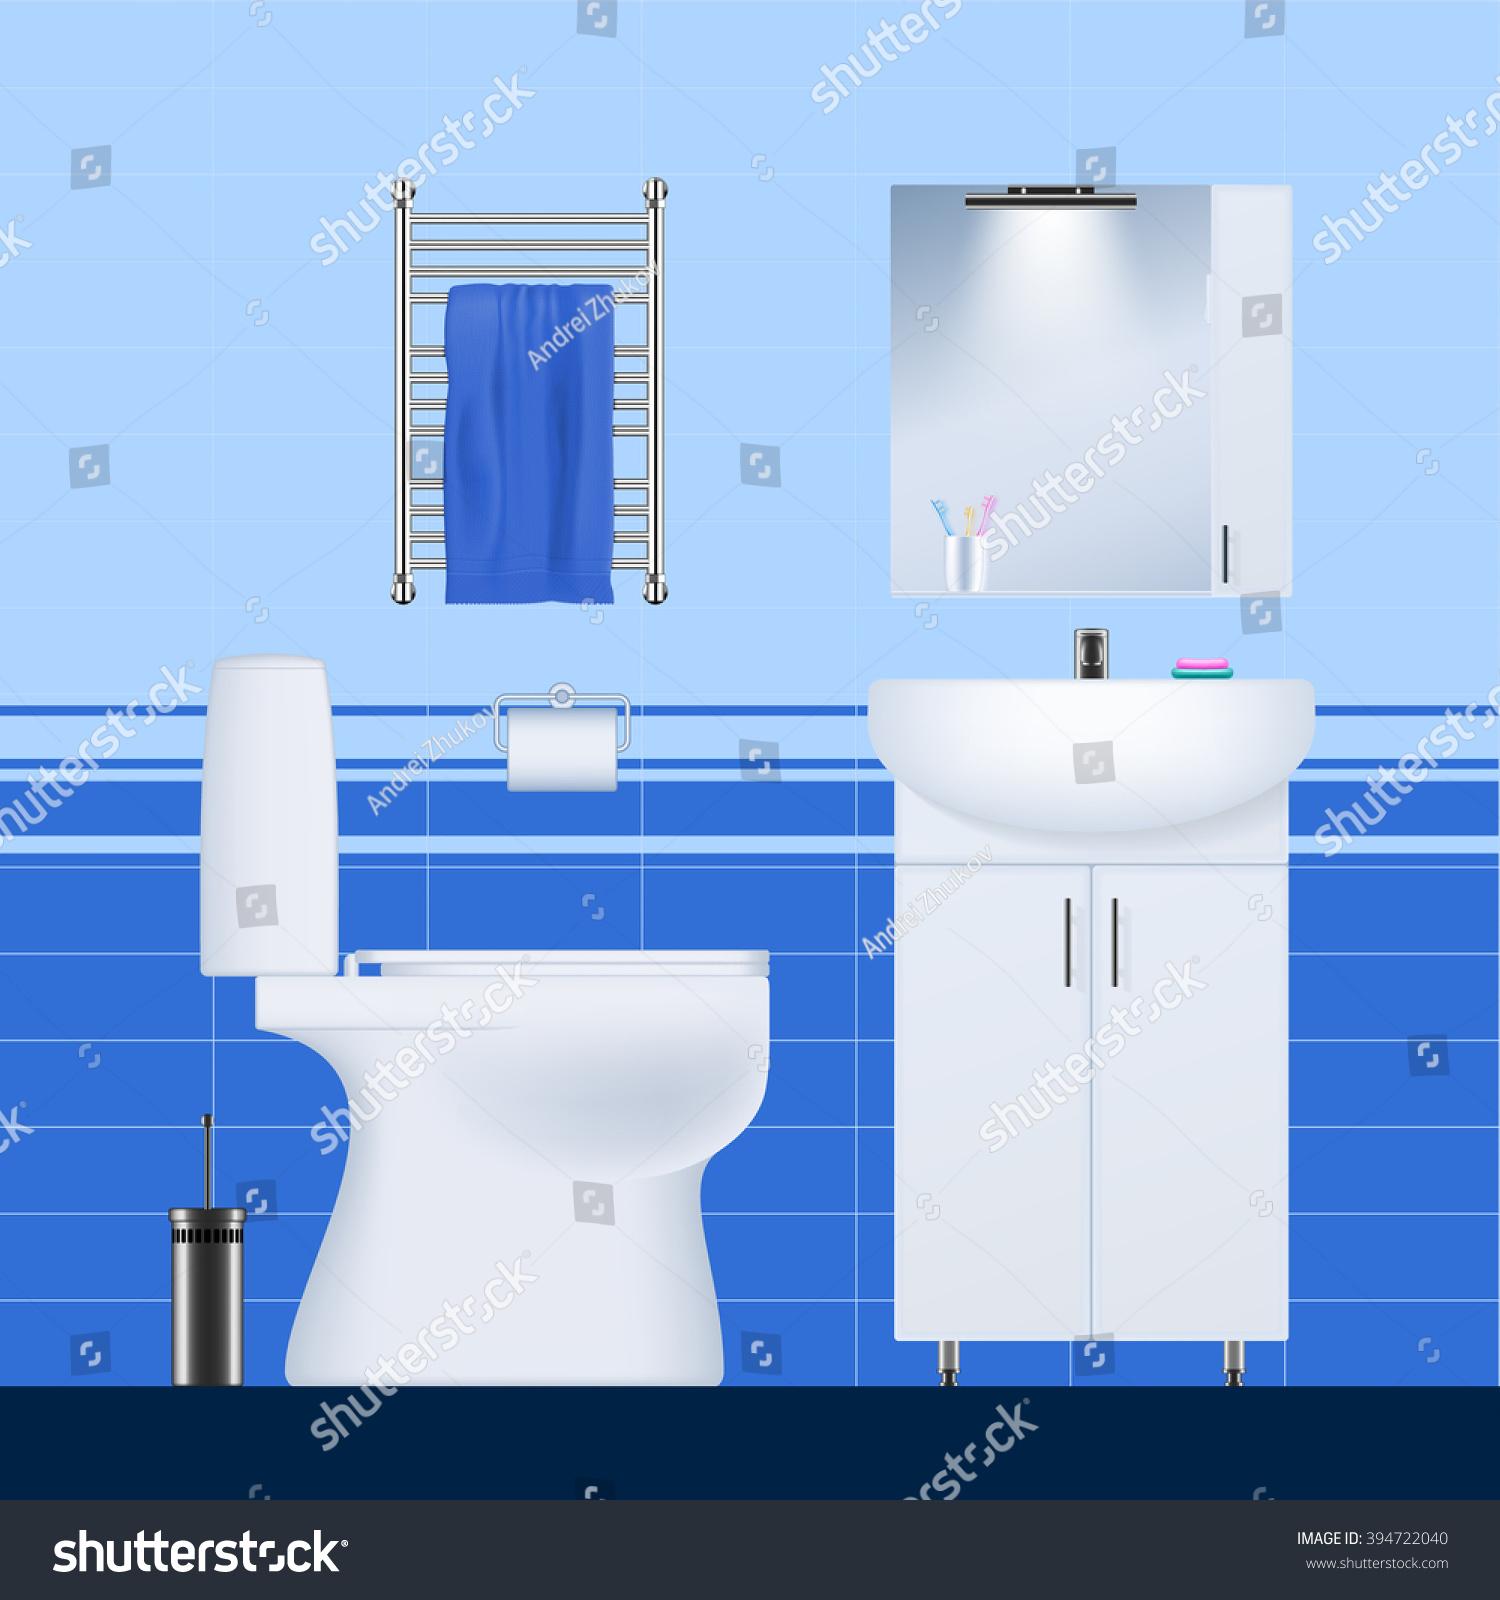 Subjects Bath Toilet Sink Cupboard Heated Stock Photo (Photo, Vector ...